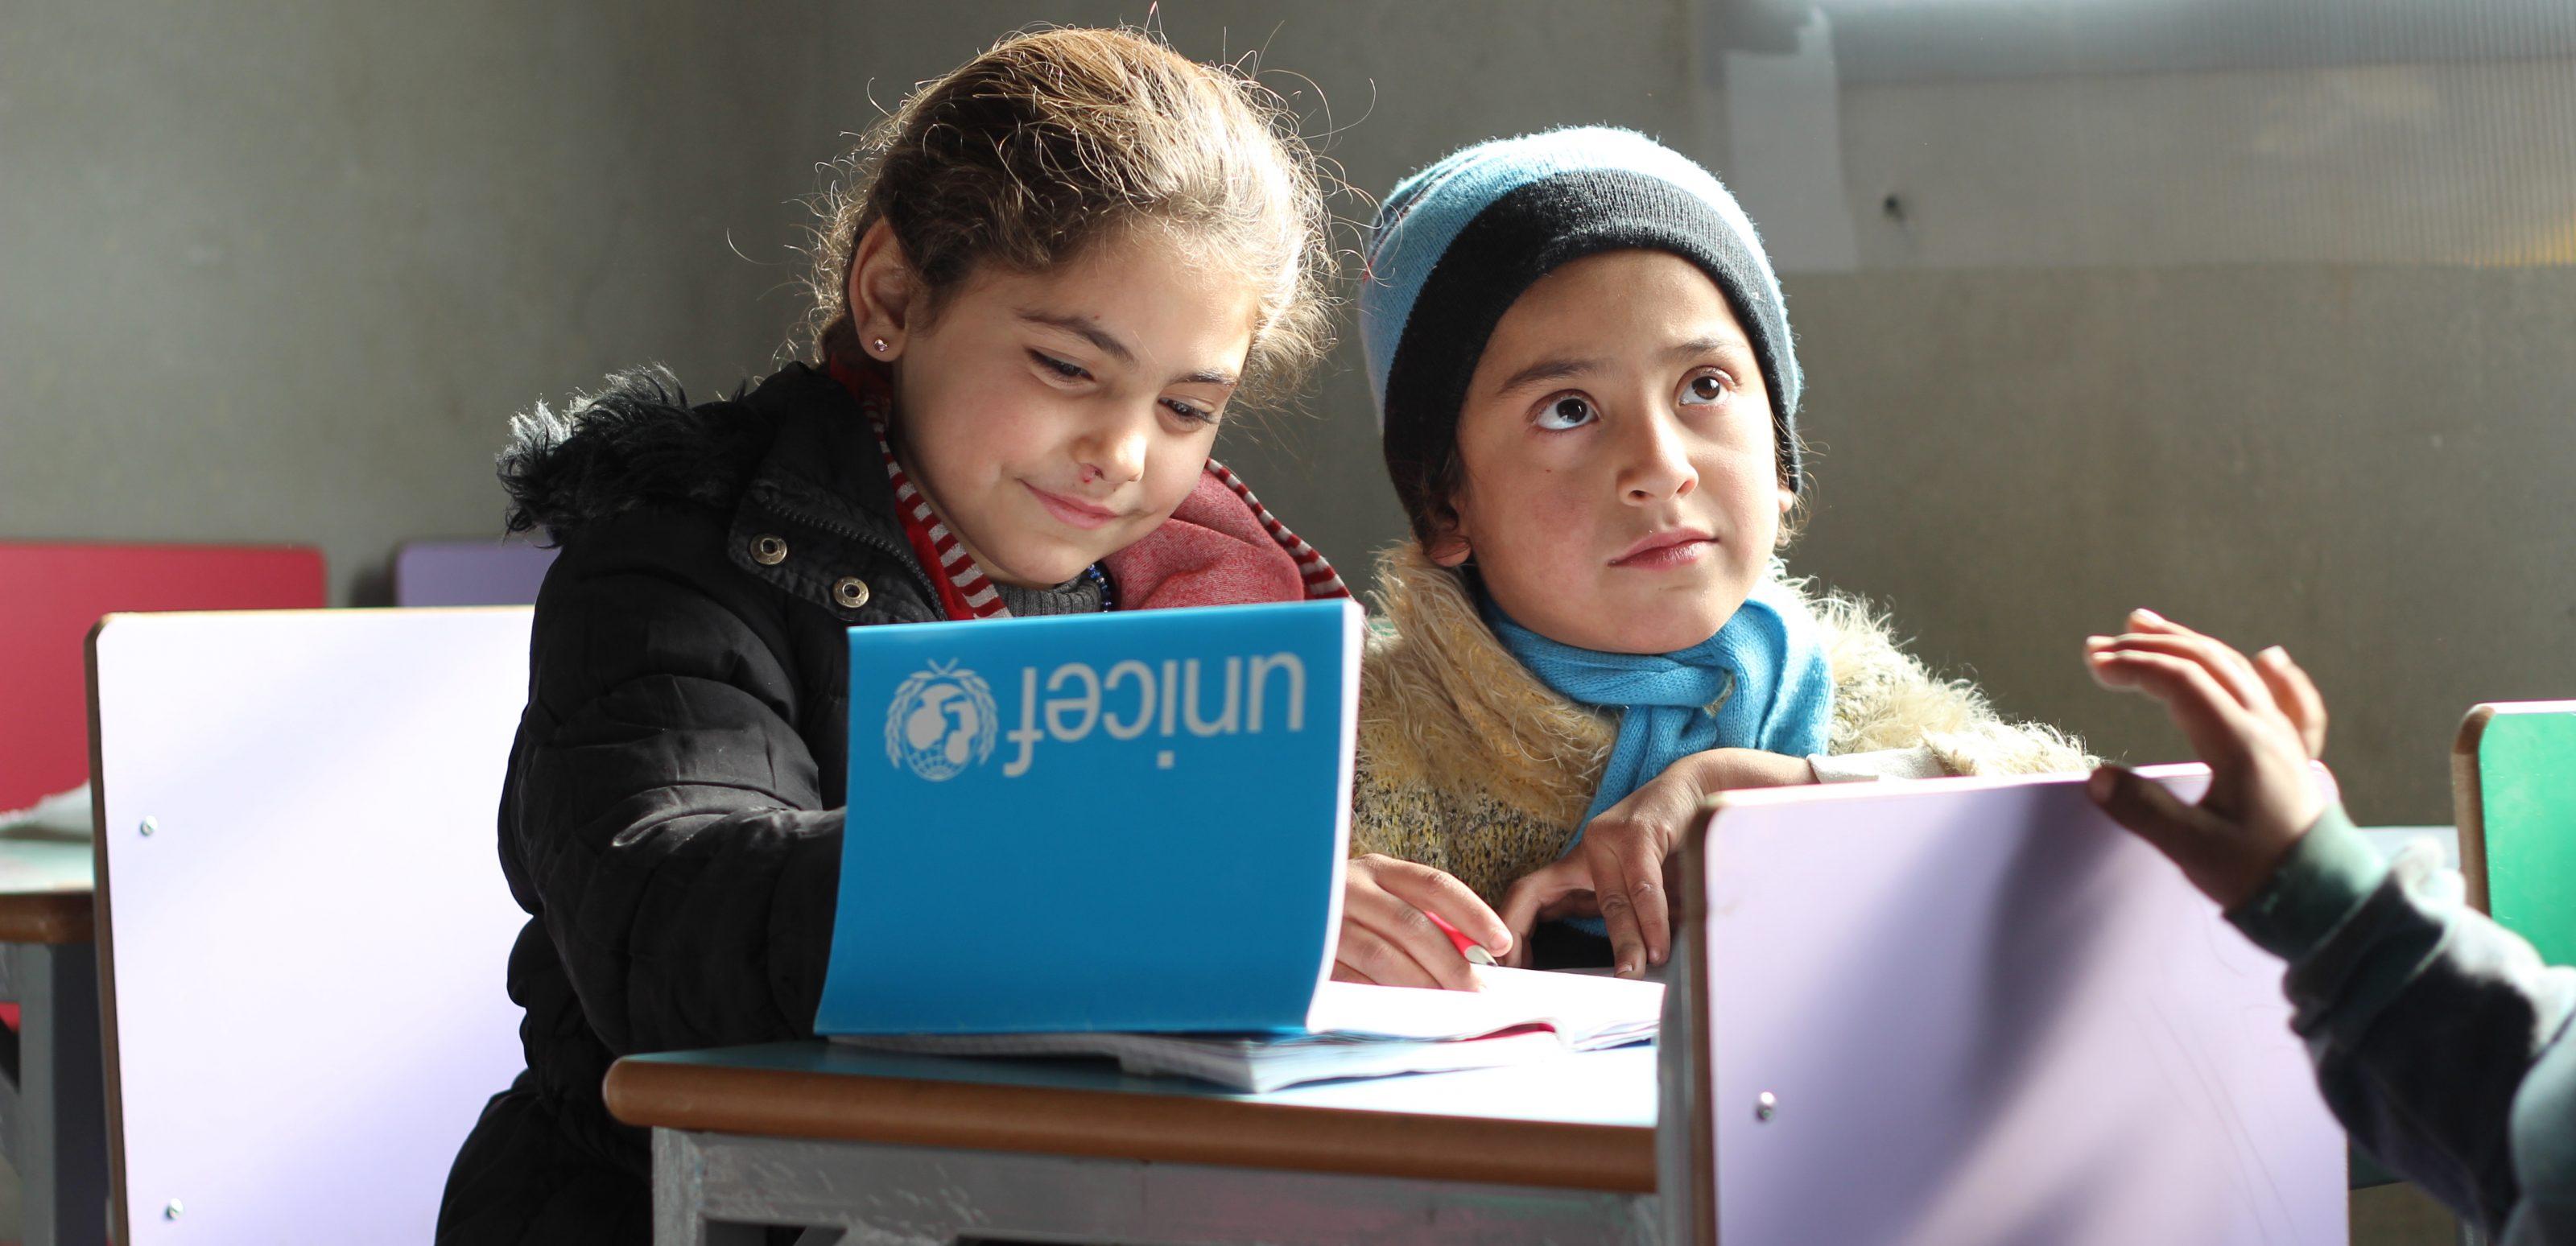 UNICEF_2016_Dec_12_Aleppo_jibreen_IDPs_School_Al-Issa_IMG_7493